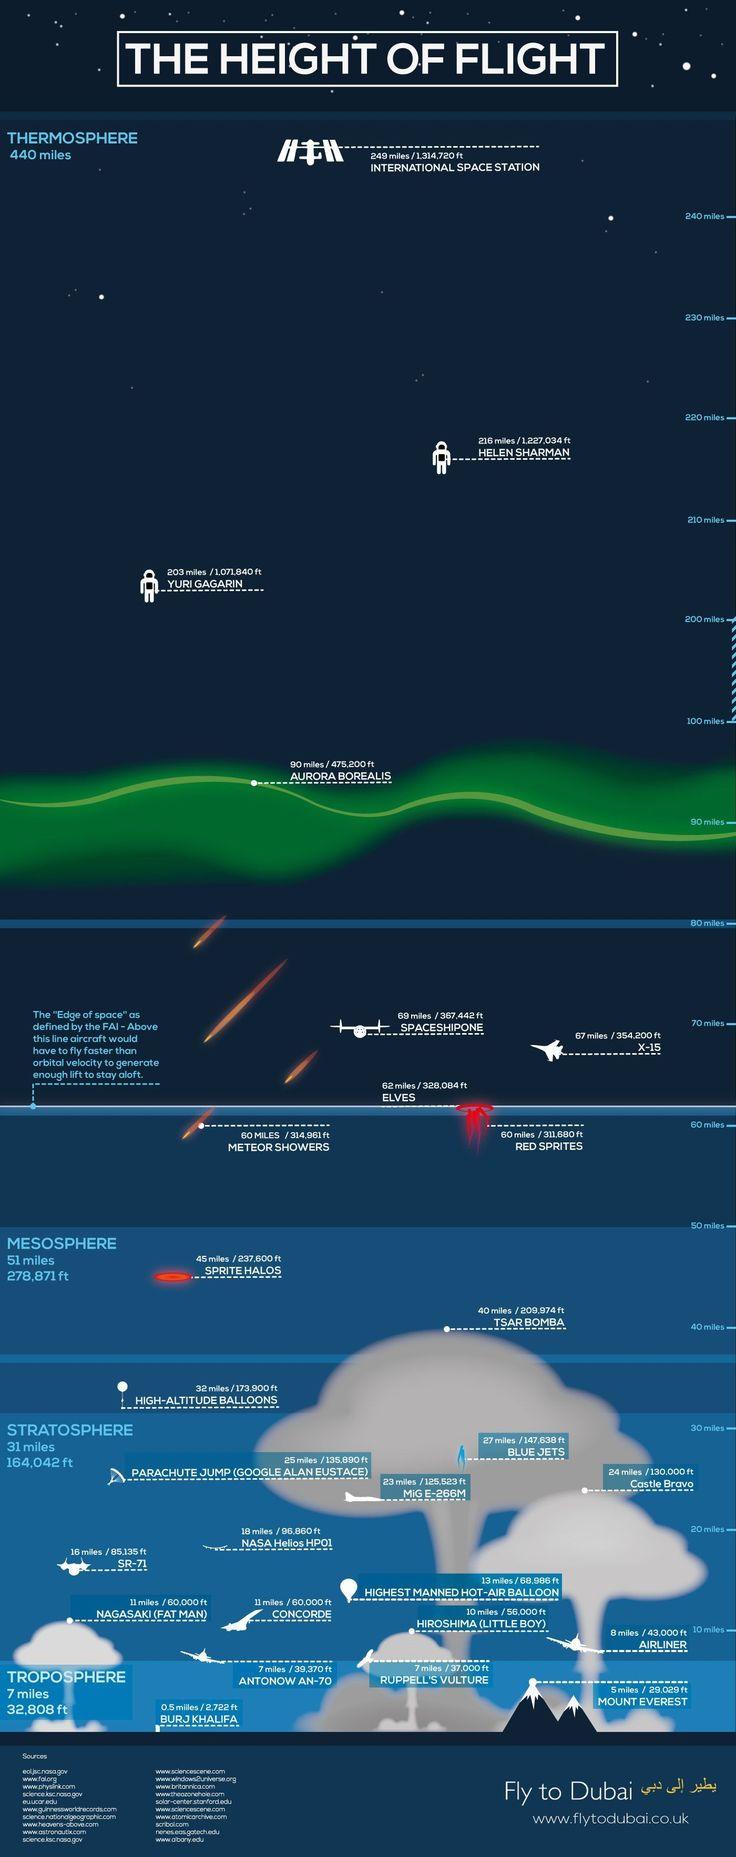 The Height of Flight #infographic #Travel #mushroominfographic